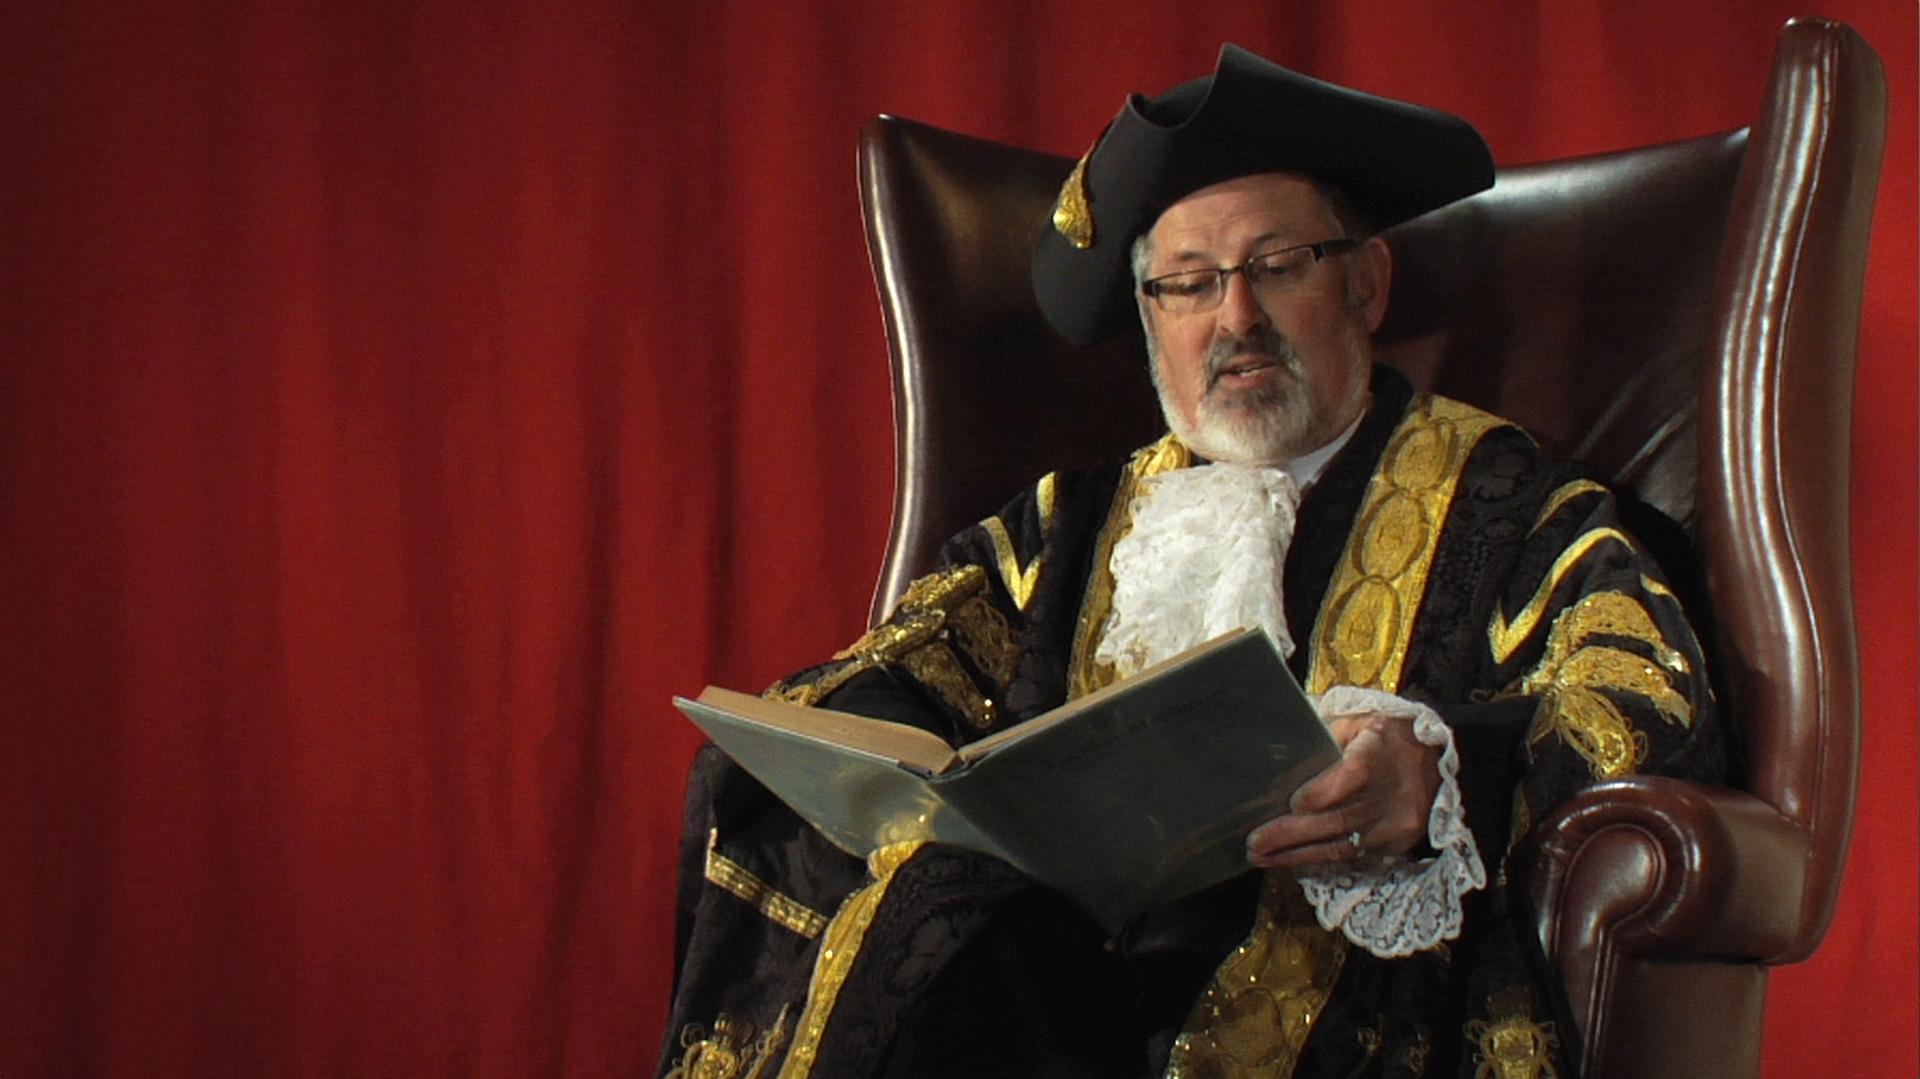 The Lord Mayor